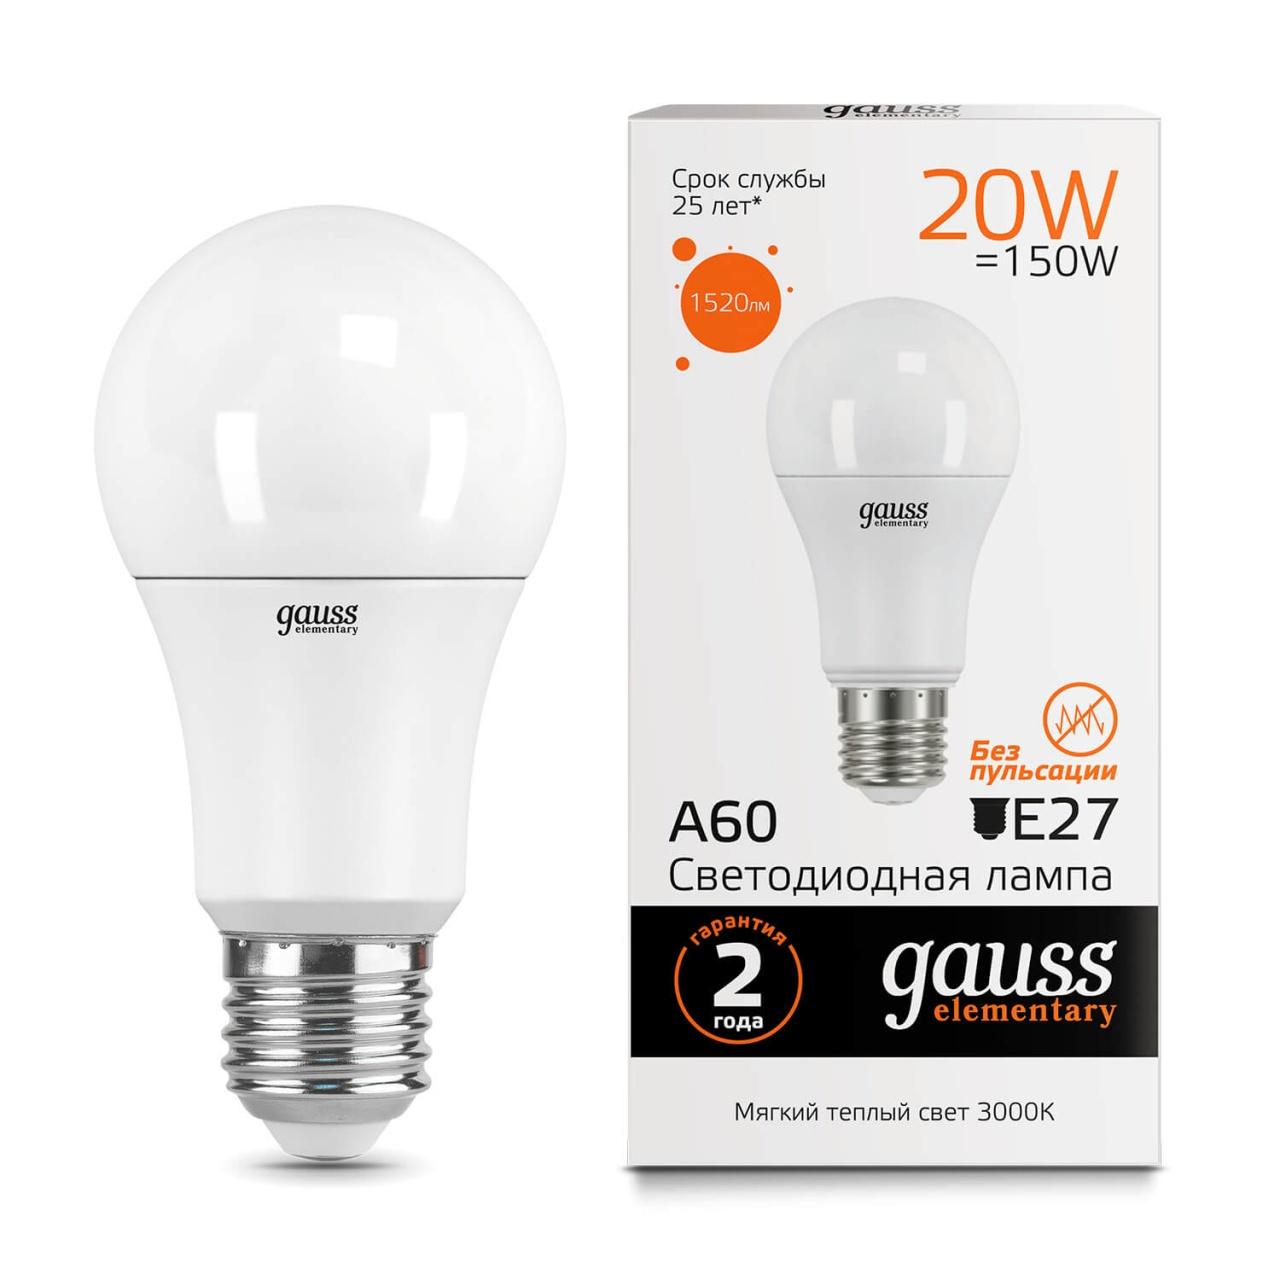 цена Лампочка Gauss 23219 Elementary A60 онлайн в 2017 году